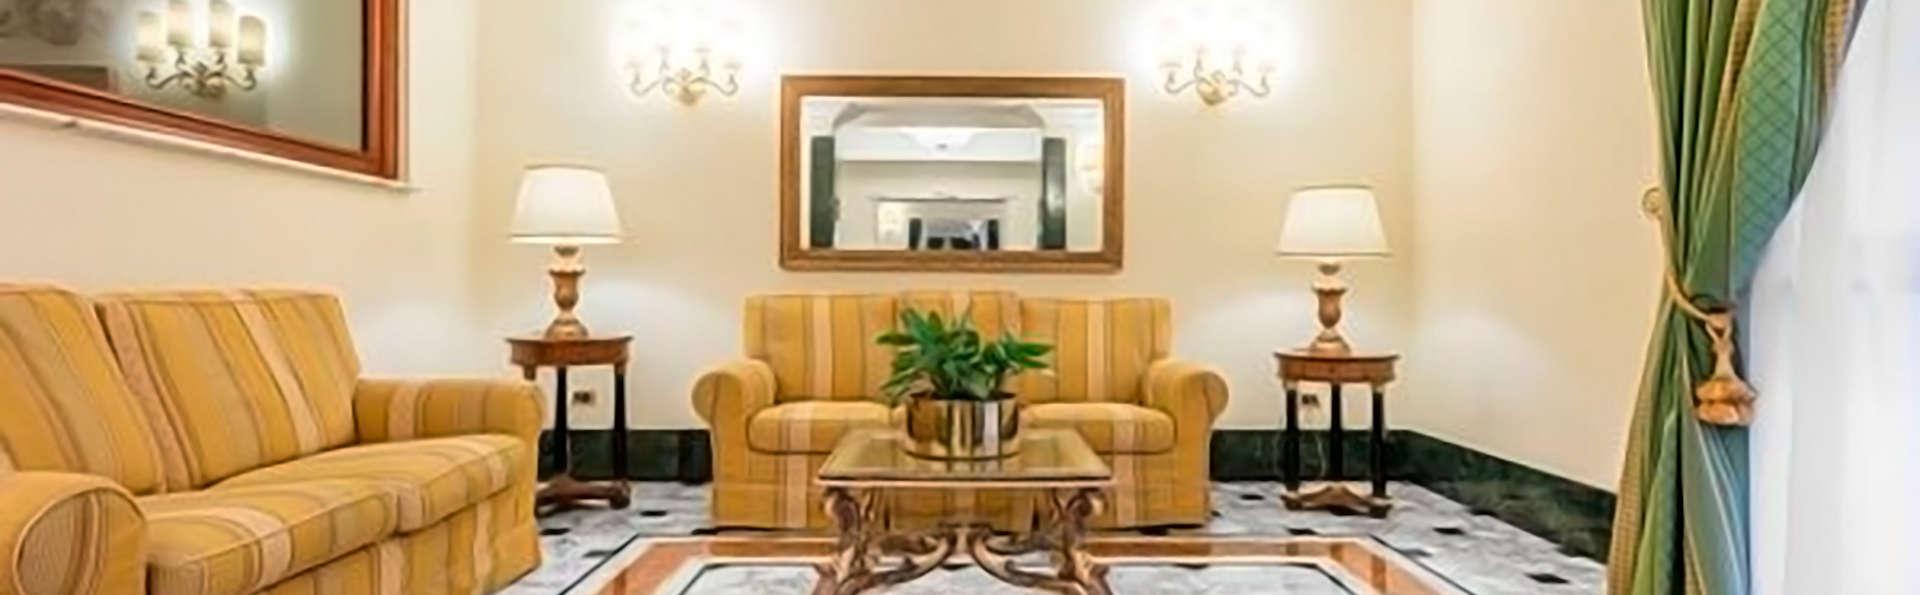 Raeli Hotel Regio - Edit_Looby.jpg